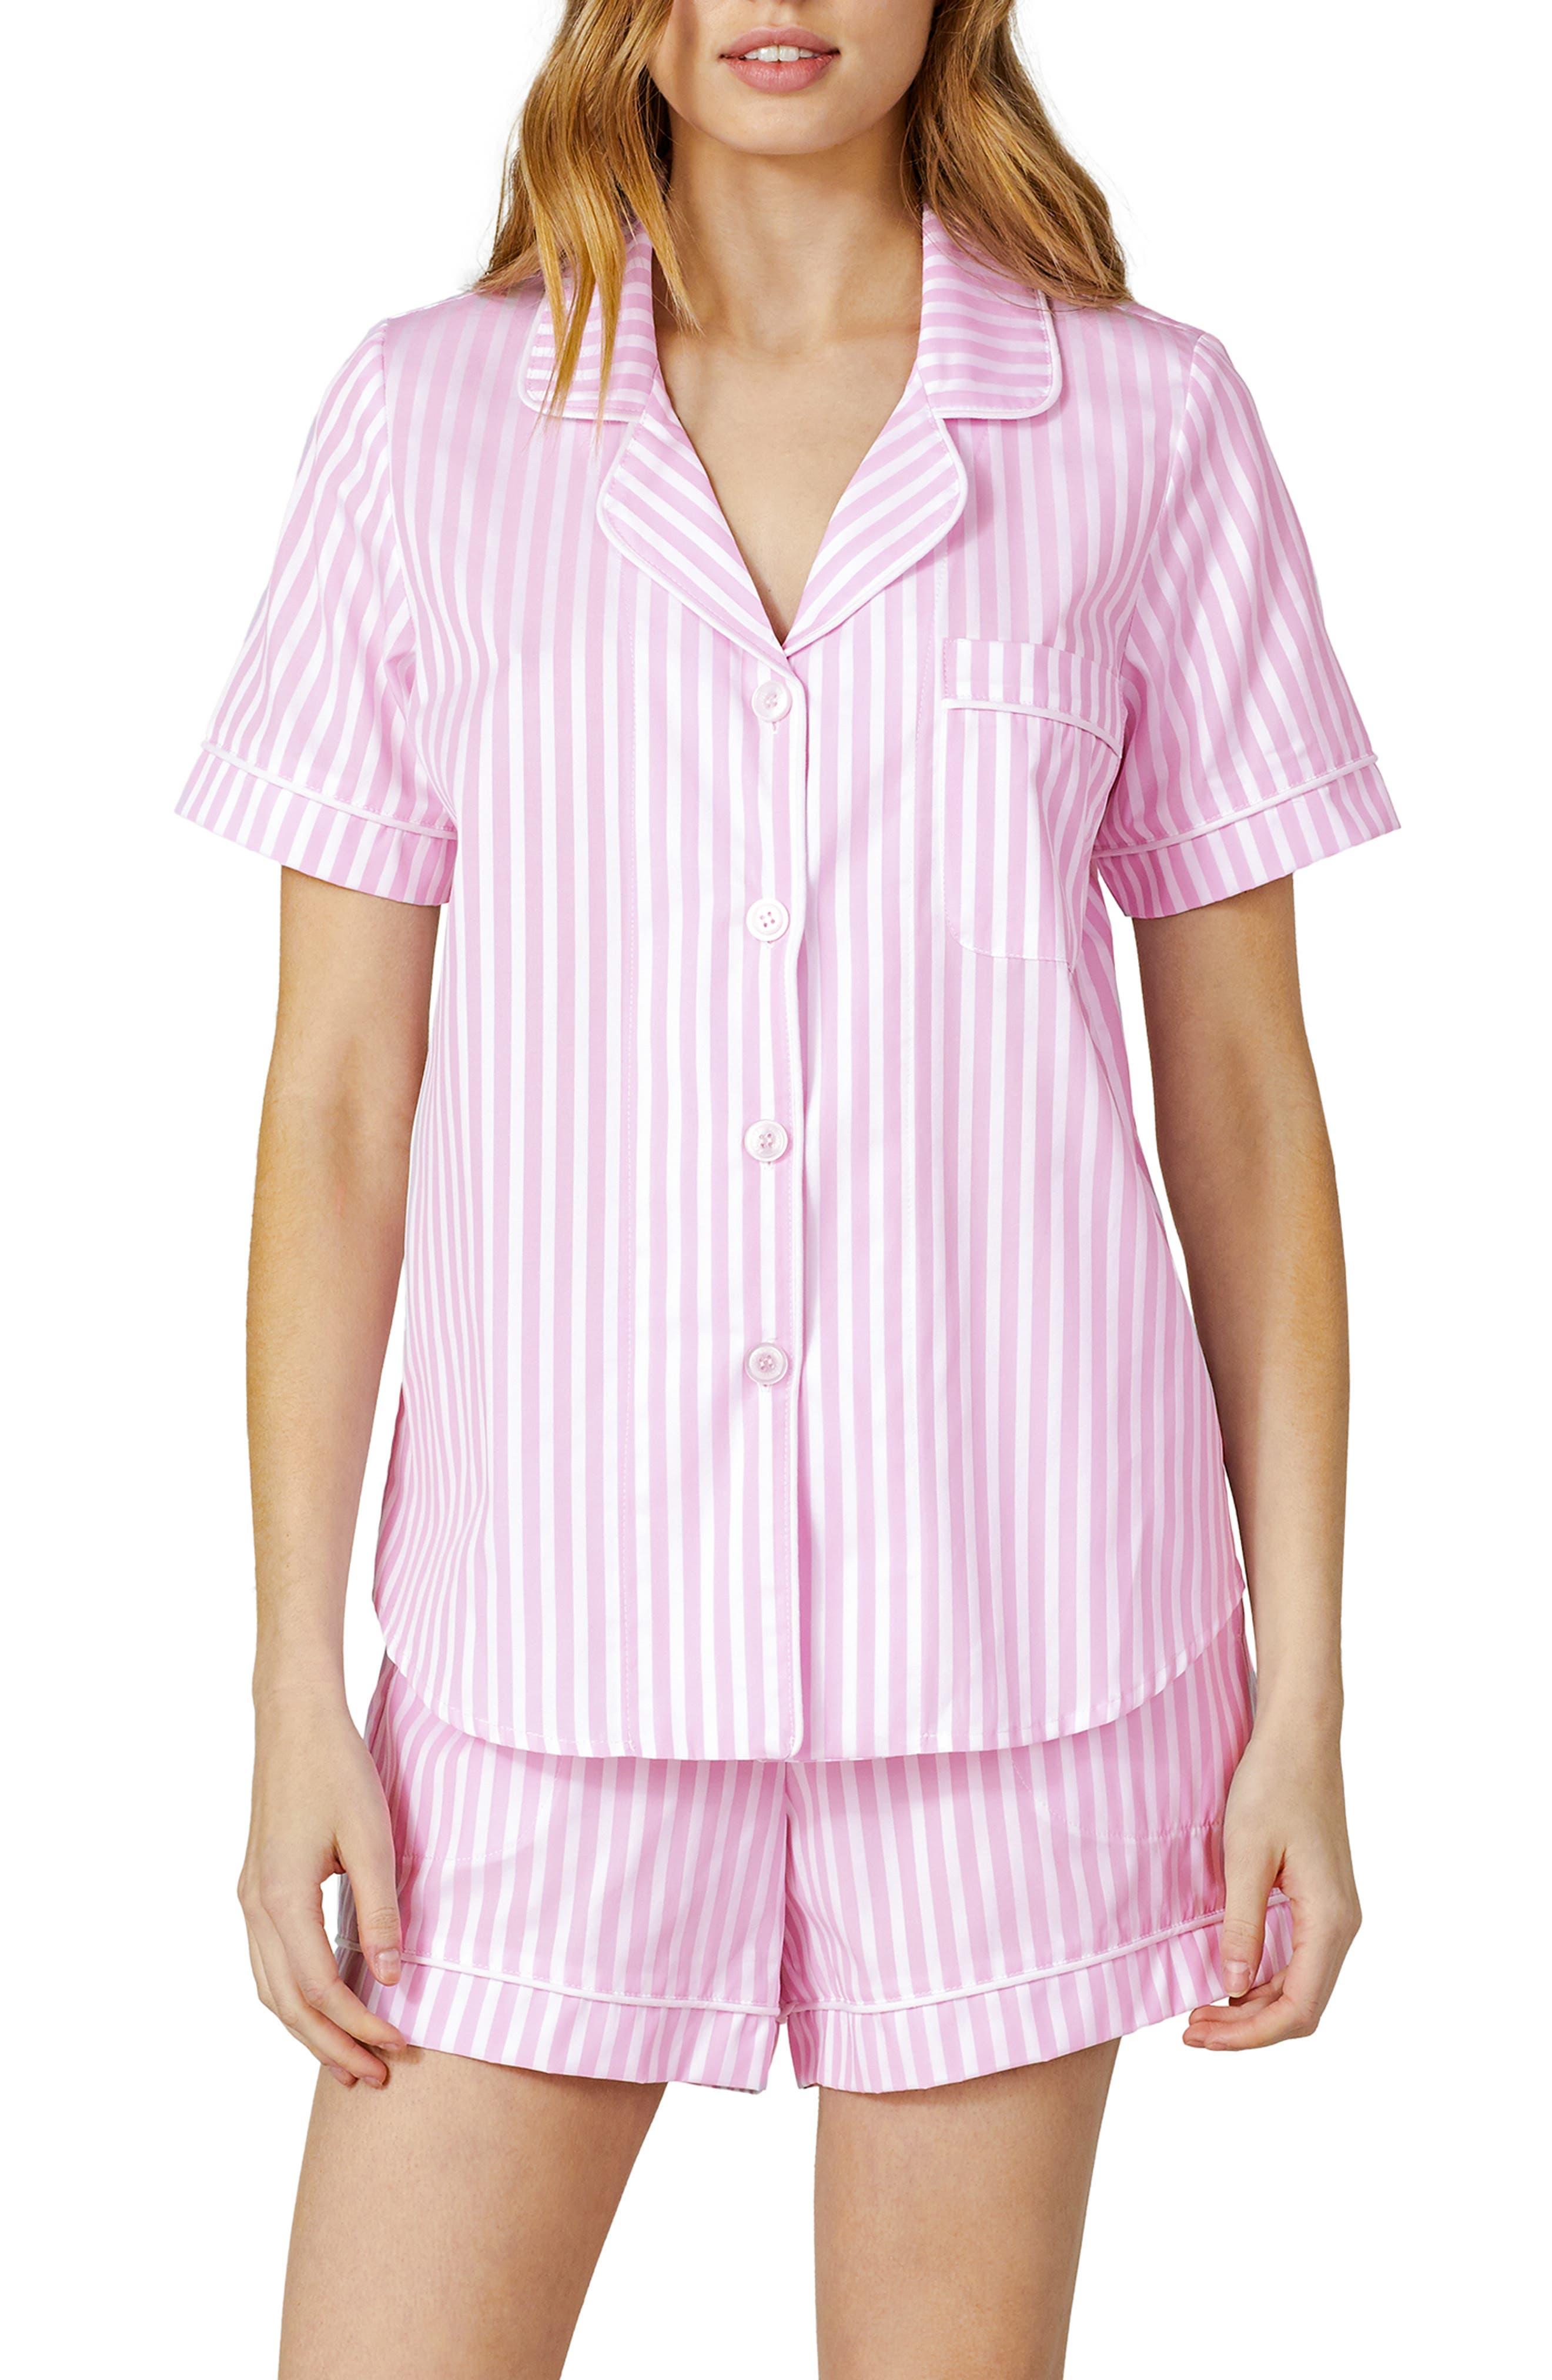 3D Stripe Organic Cotton Sateen Short Pajamas